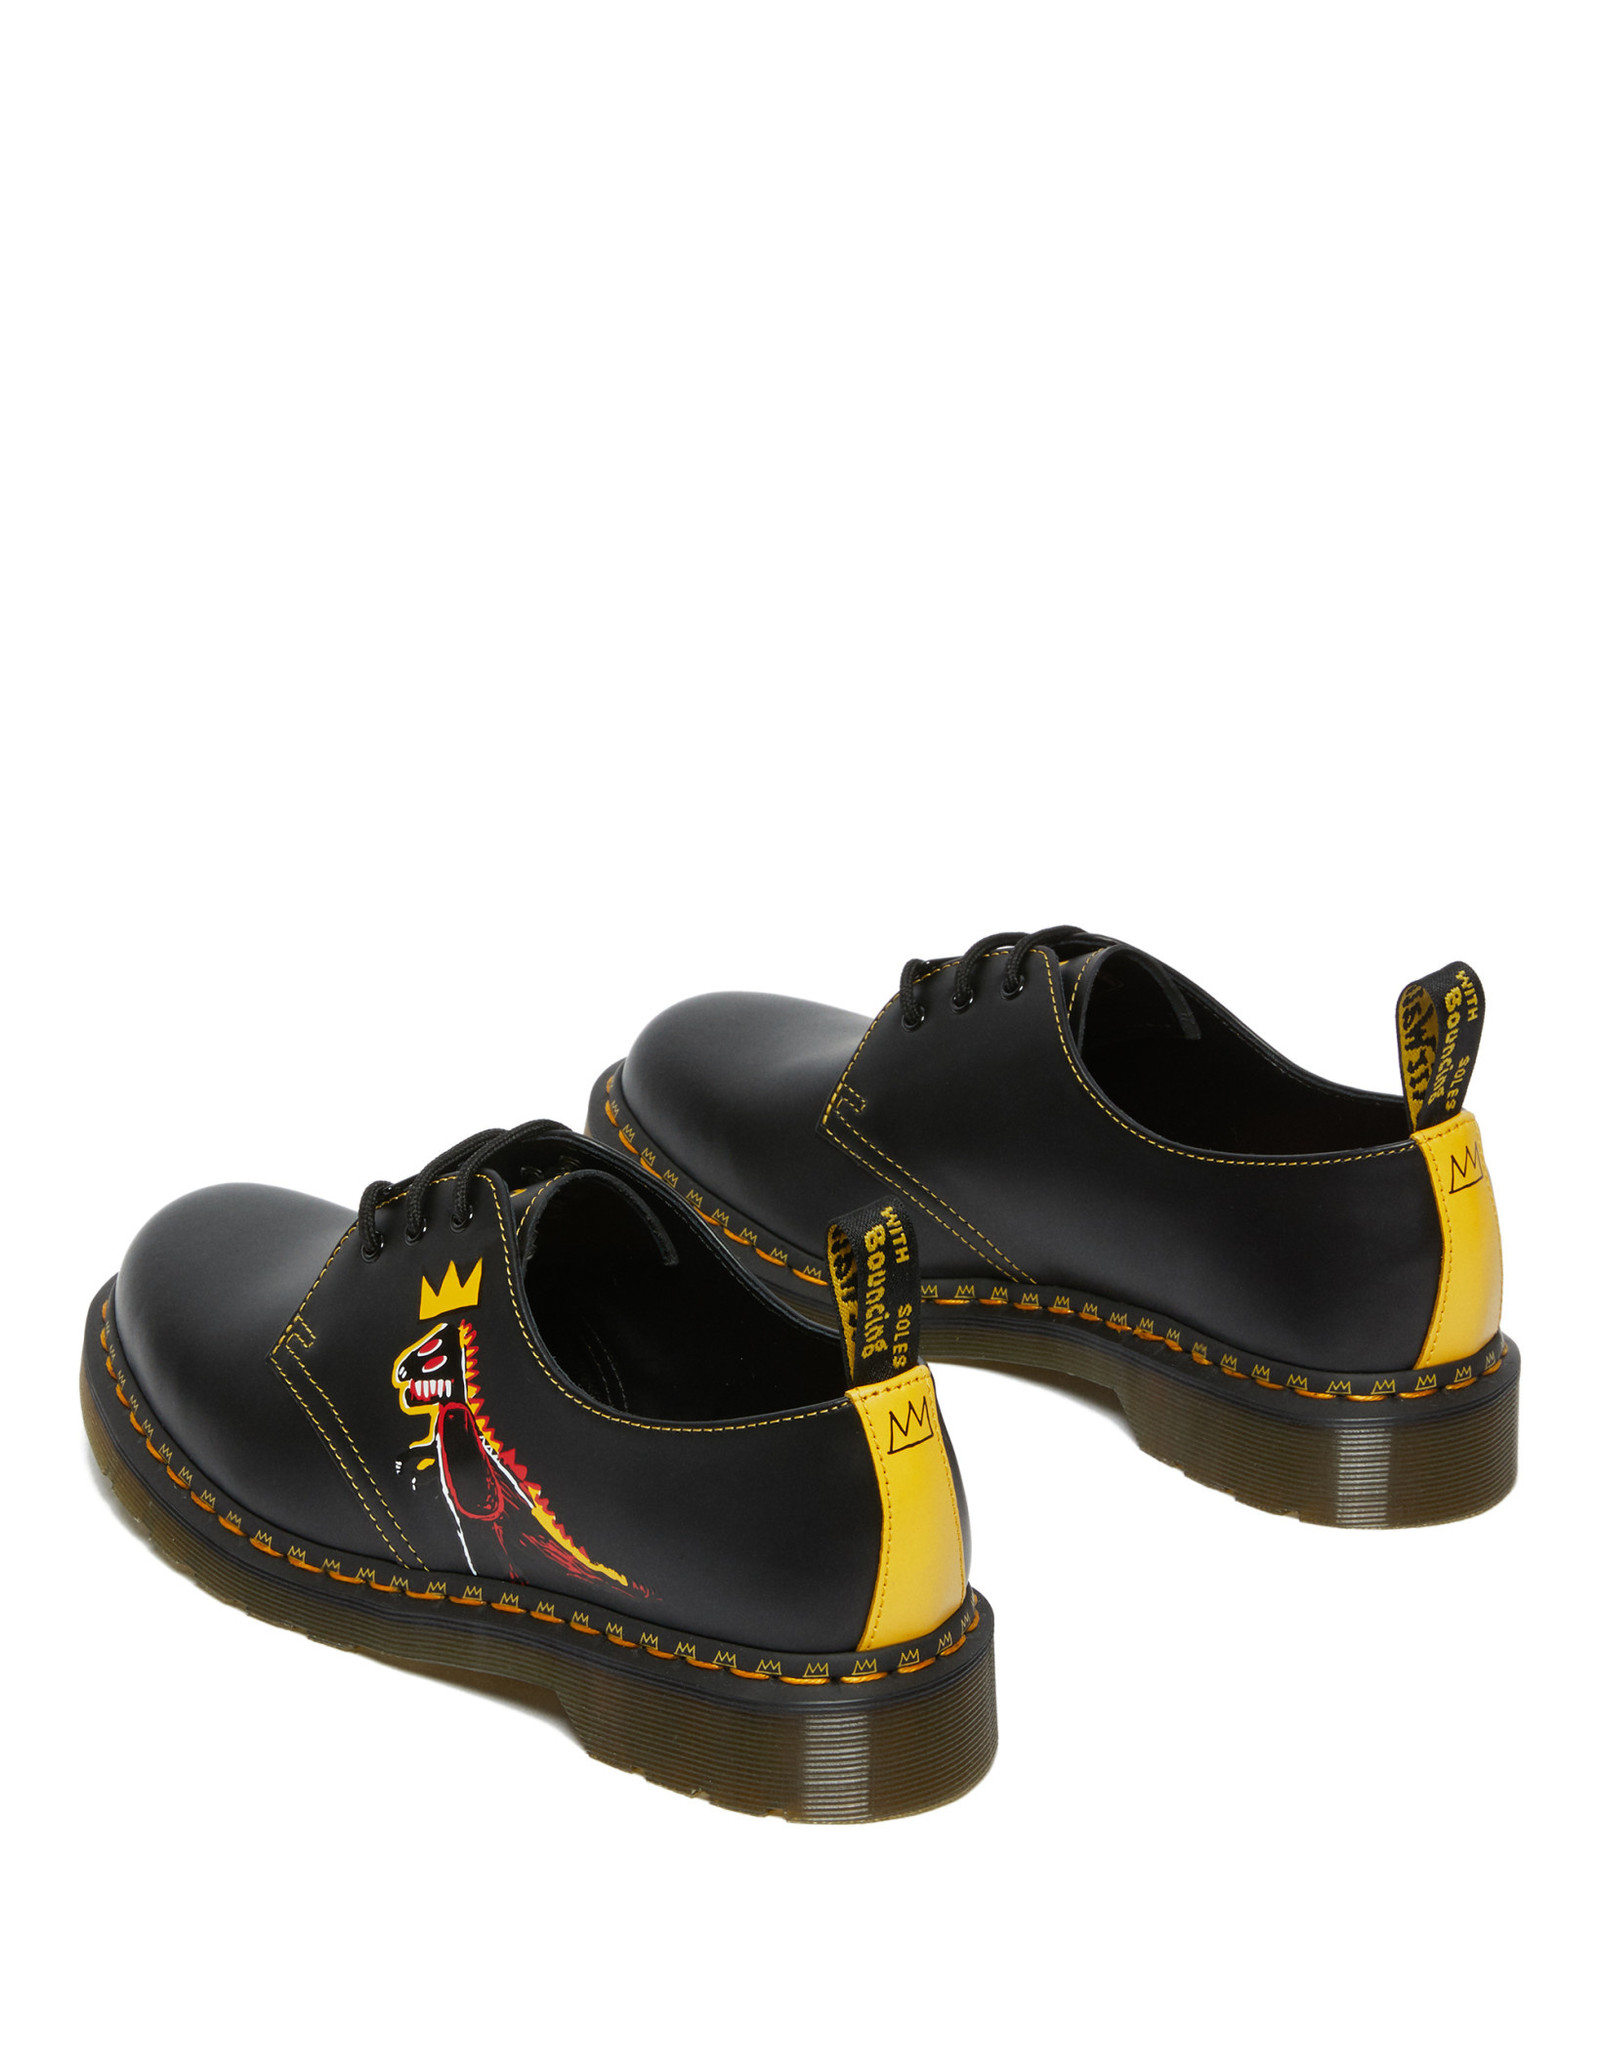 DR. MARTENS 1461 BASQUIAT II BLACK + DMS YELLOW PEZ SMOOTH + SMOOTH 301BASQ-R27186001